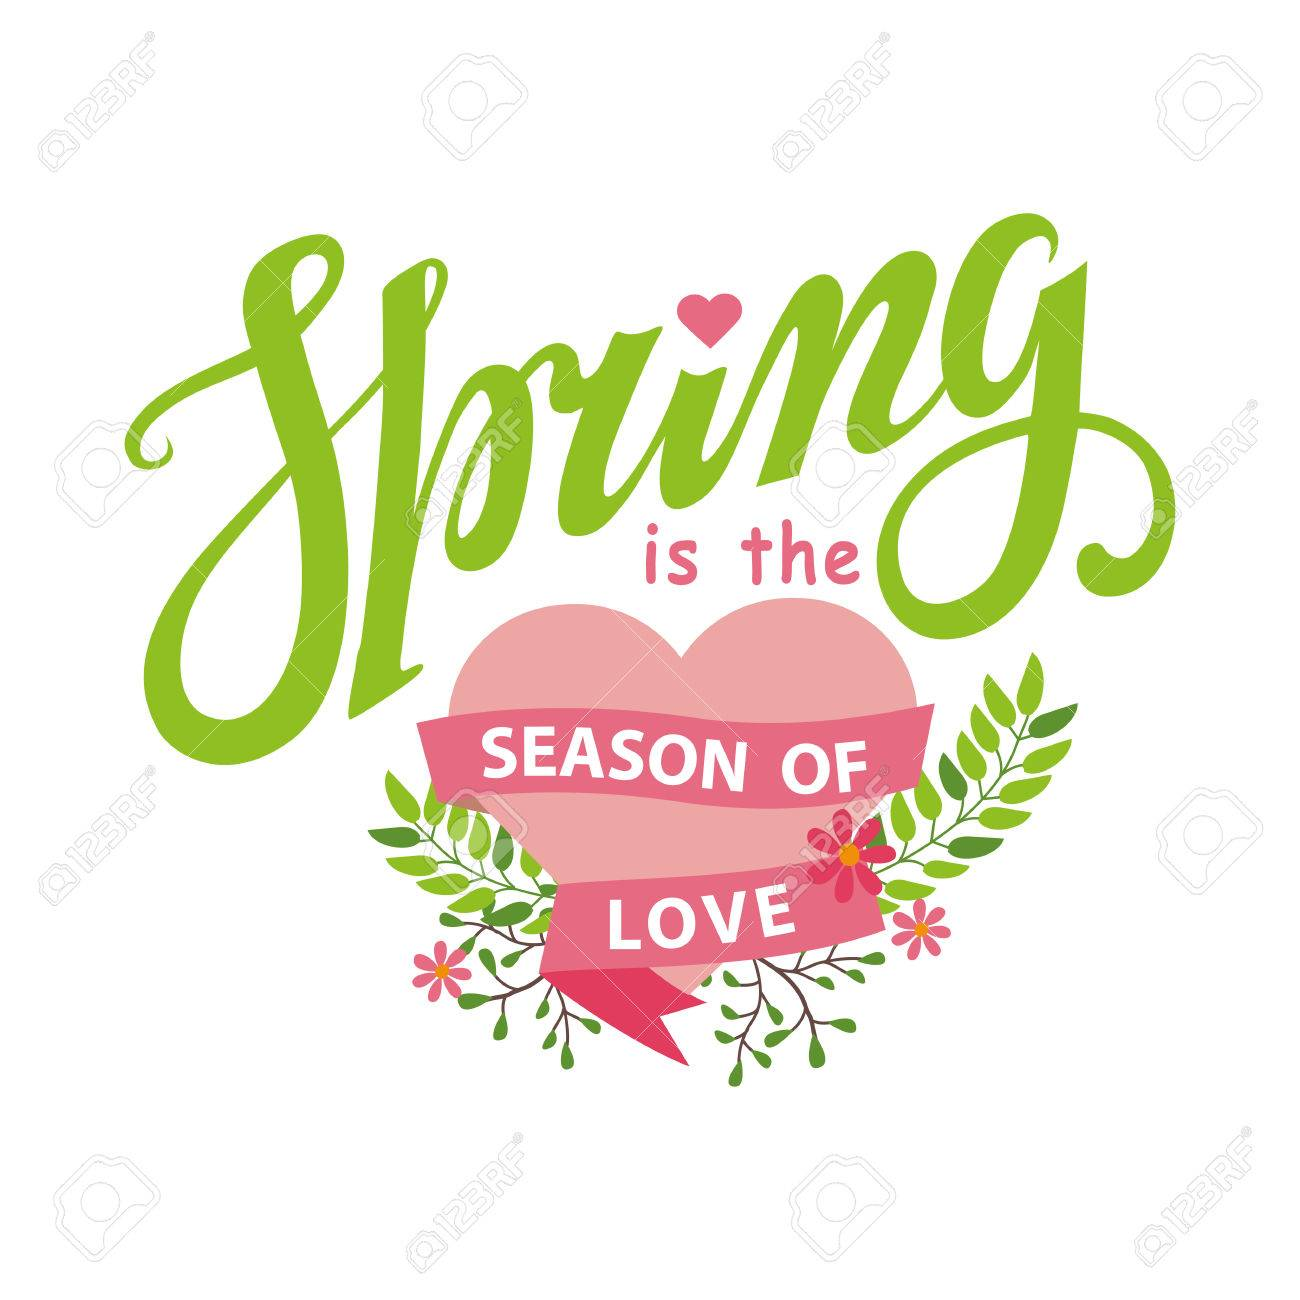 Spring season cardposternctor title season of lovertoon vector title season of lovertoon flower kristyandbryce Image collections